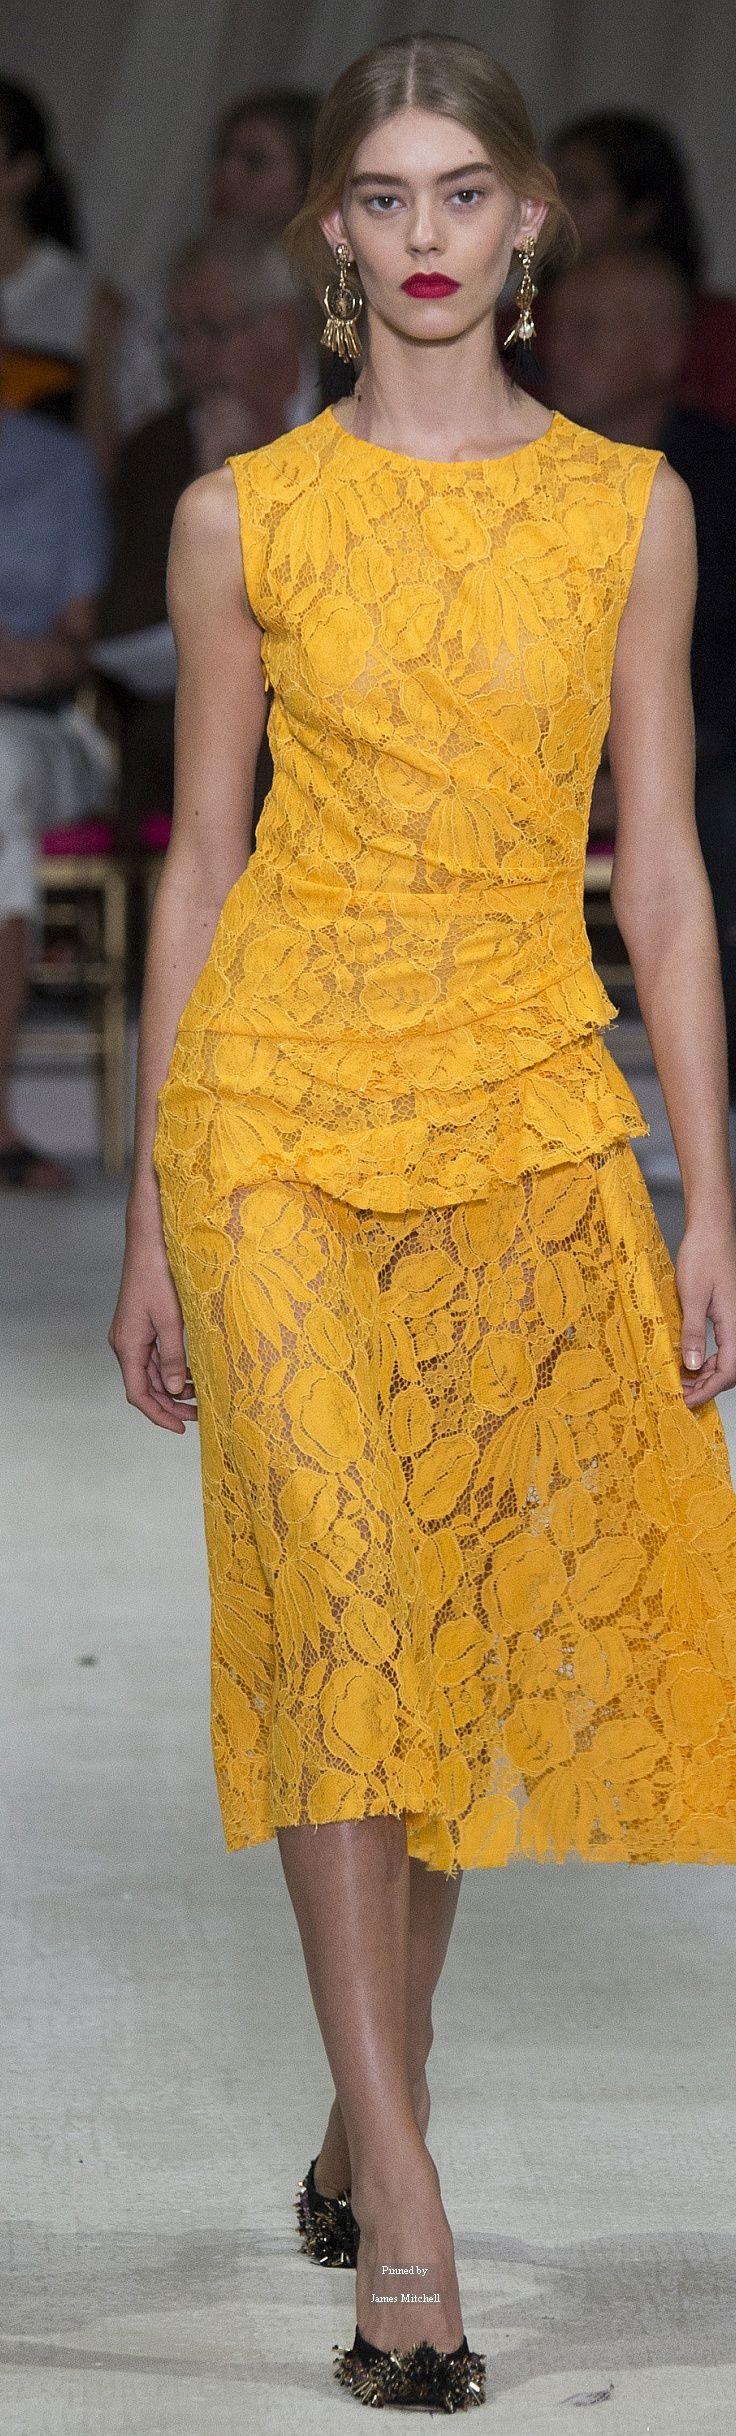 #Farbbberatung #Stilberatung #Farbenreich mit www.farben-reich.com Oscar de la Renta Collection Spring 2016 Ready-to-Wear